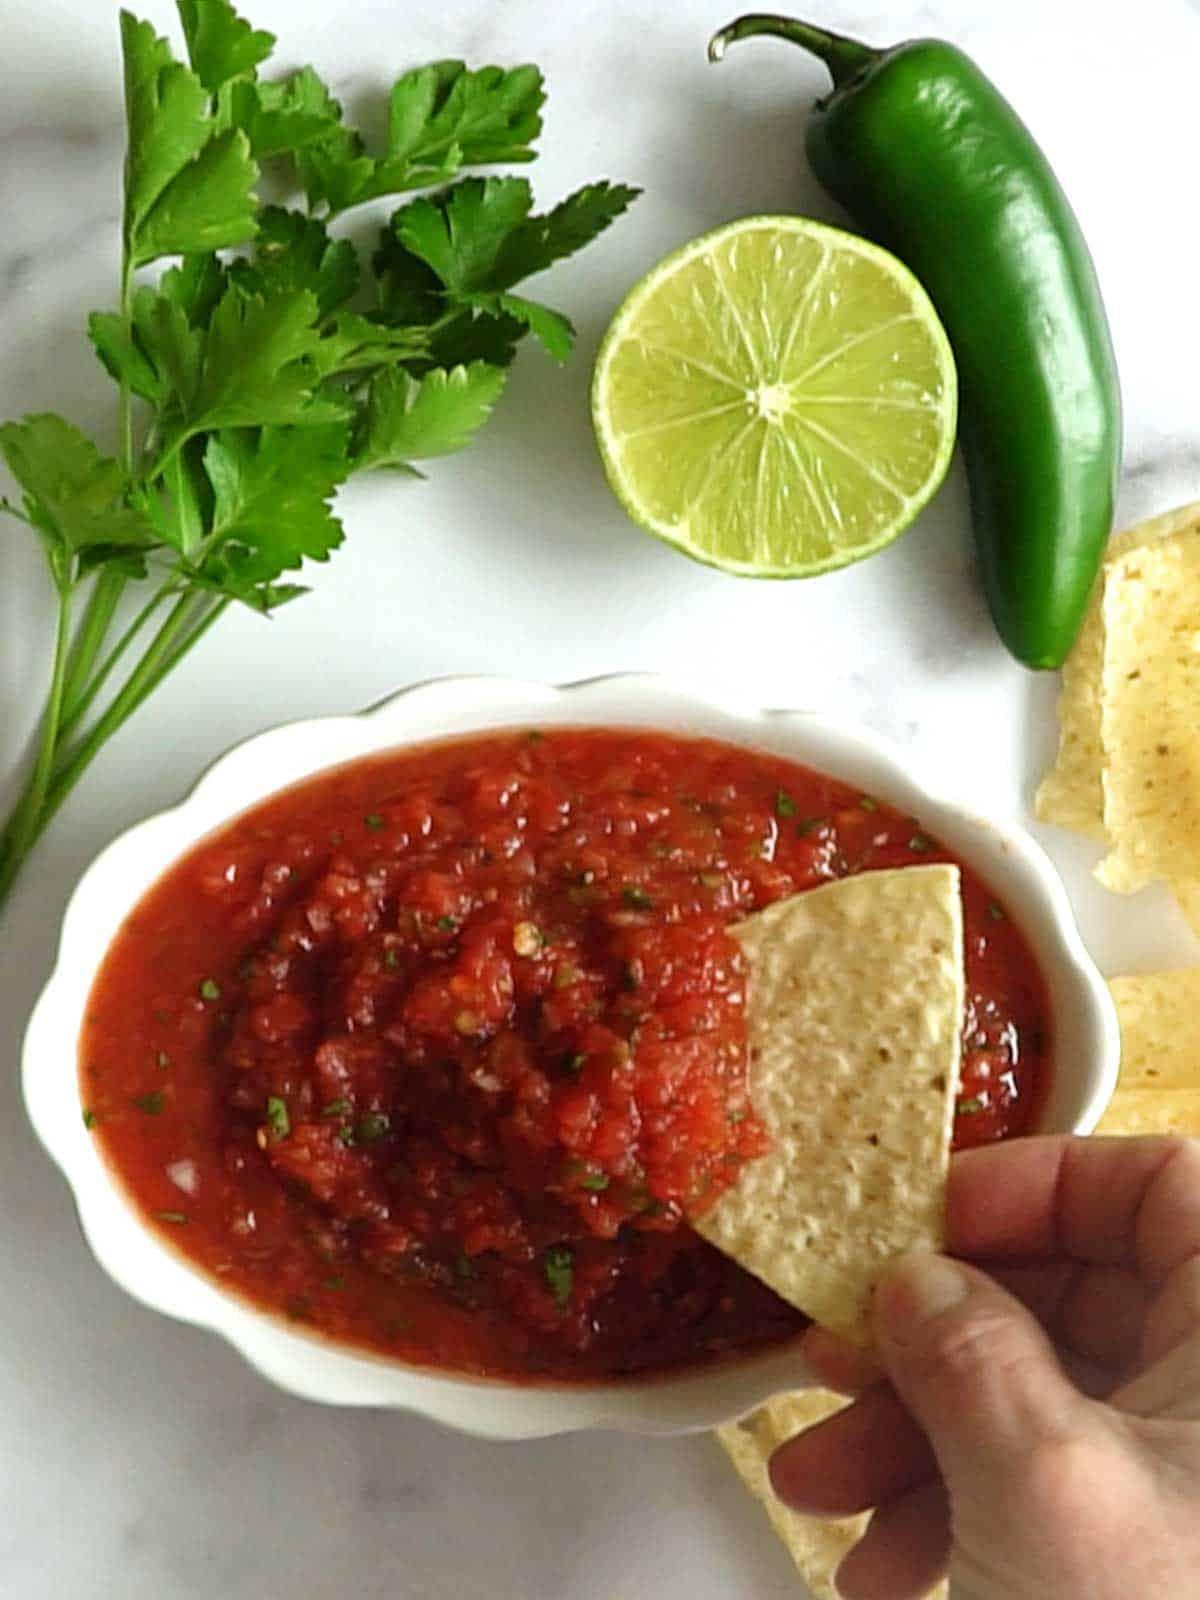 Restaurant Style salsa with tortilla chip.